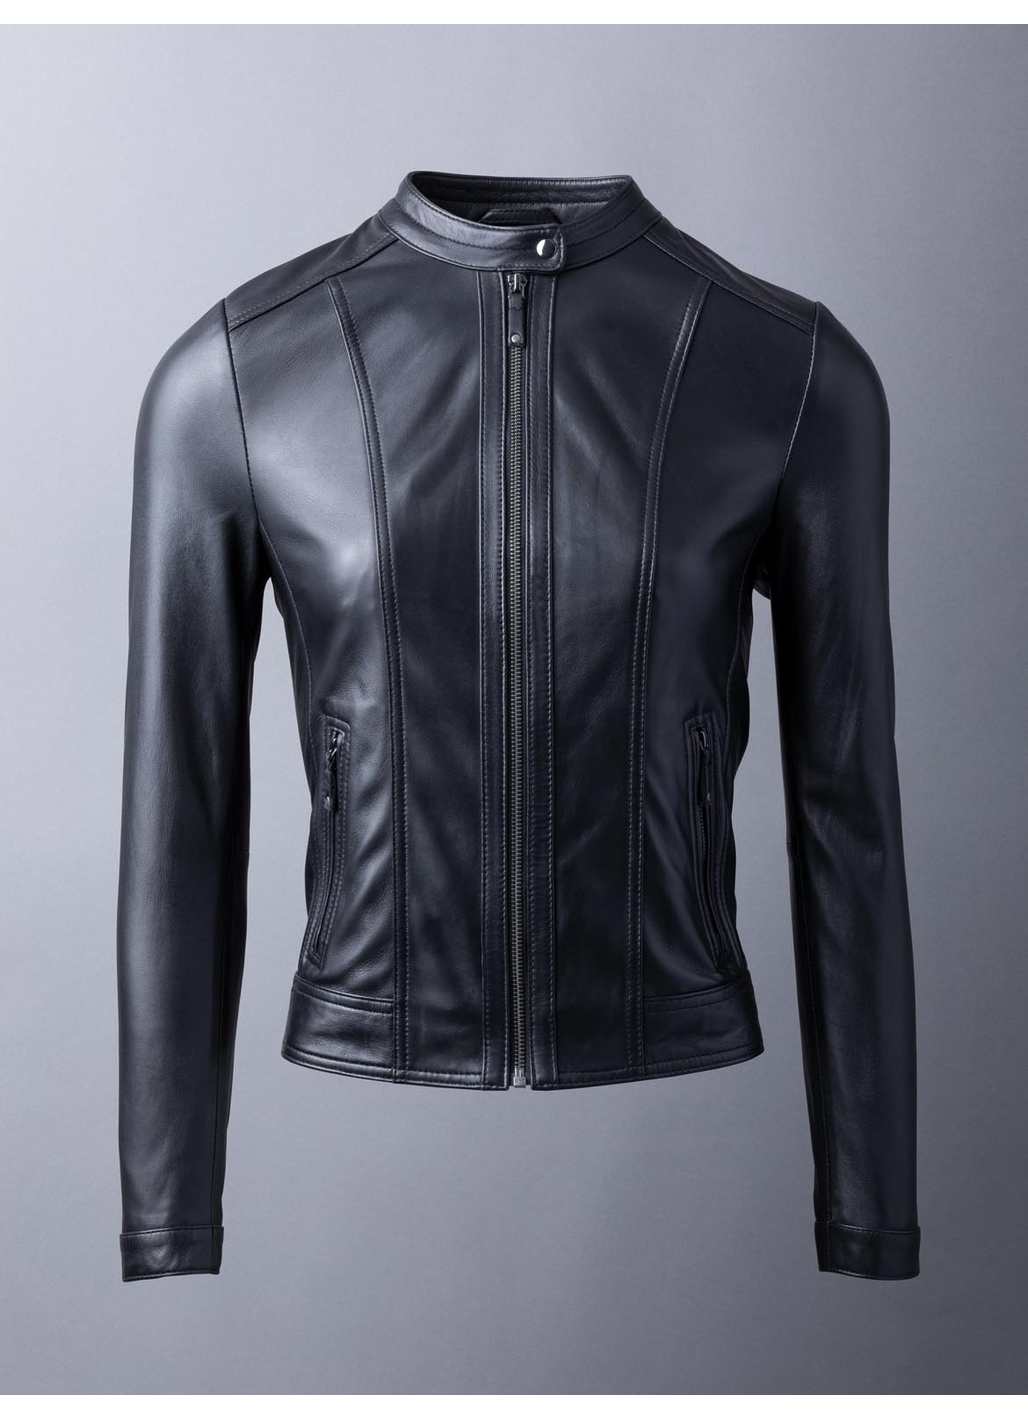 Thorpe Leather Jacket in Black